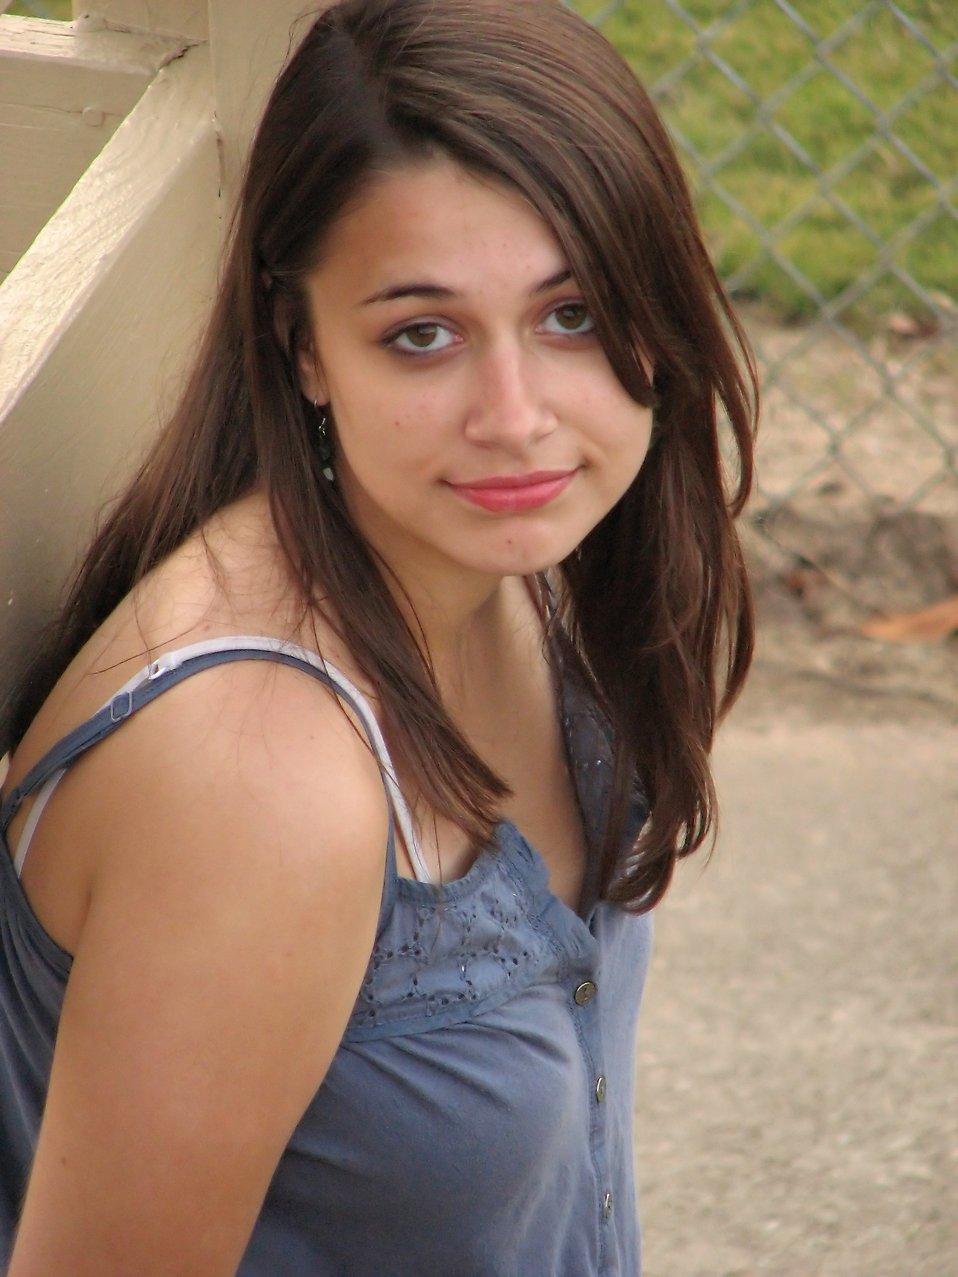 Girl Beautiful | Free Stock Photo | Close-up portrait of a ... on Beautiful Teen Girl  id=49920